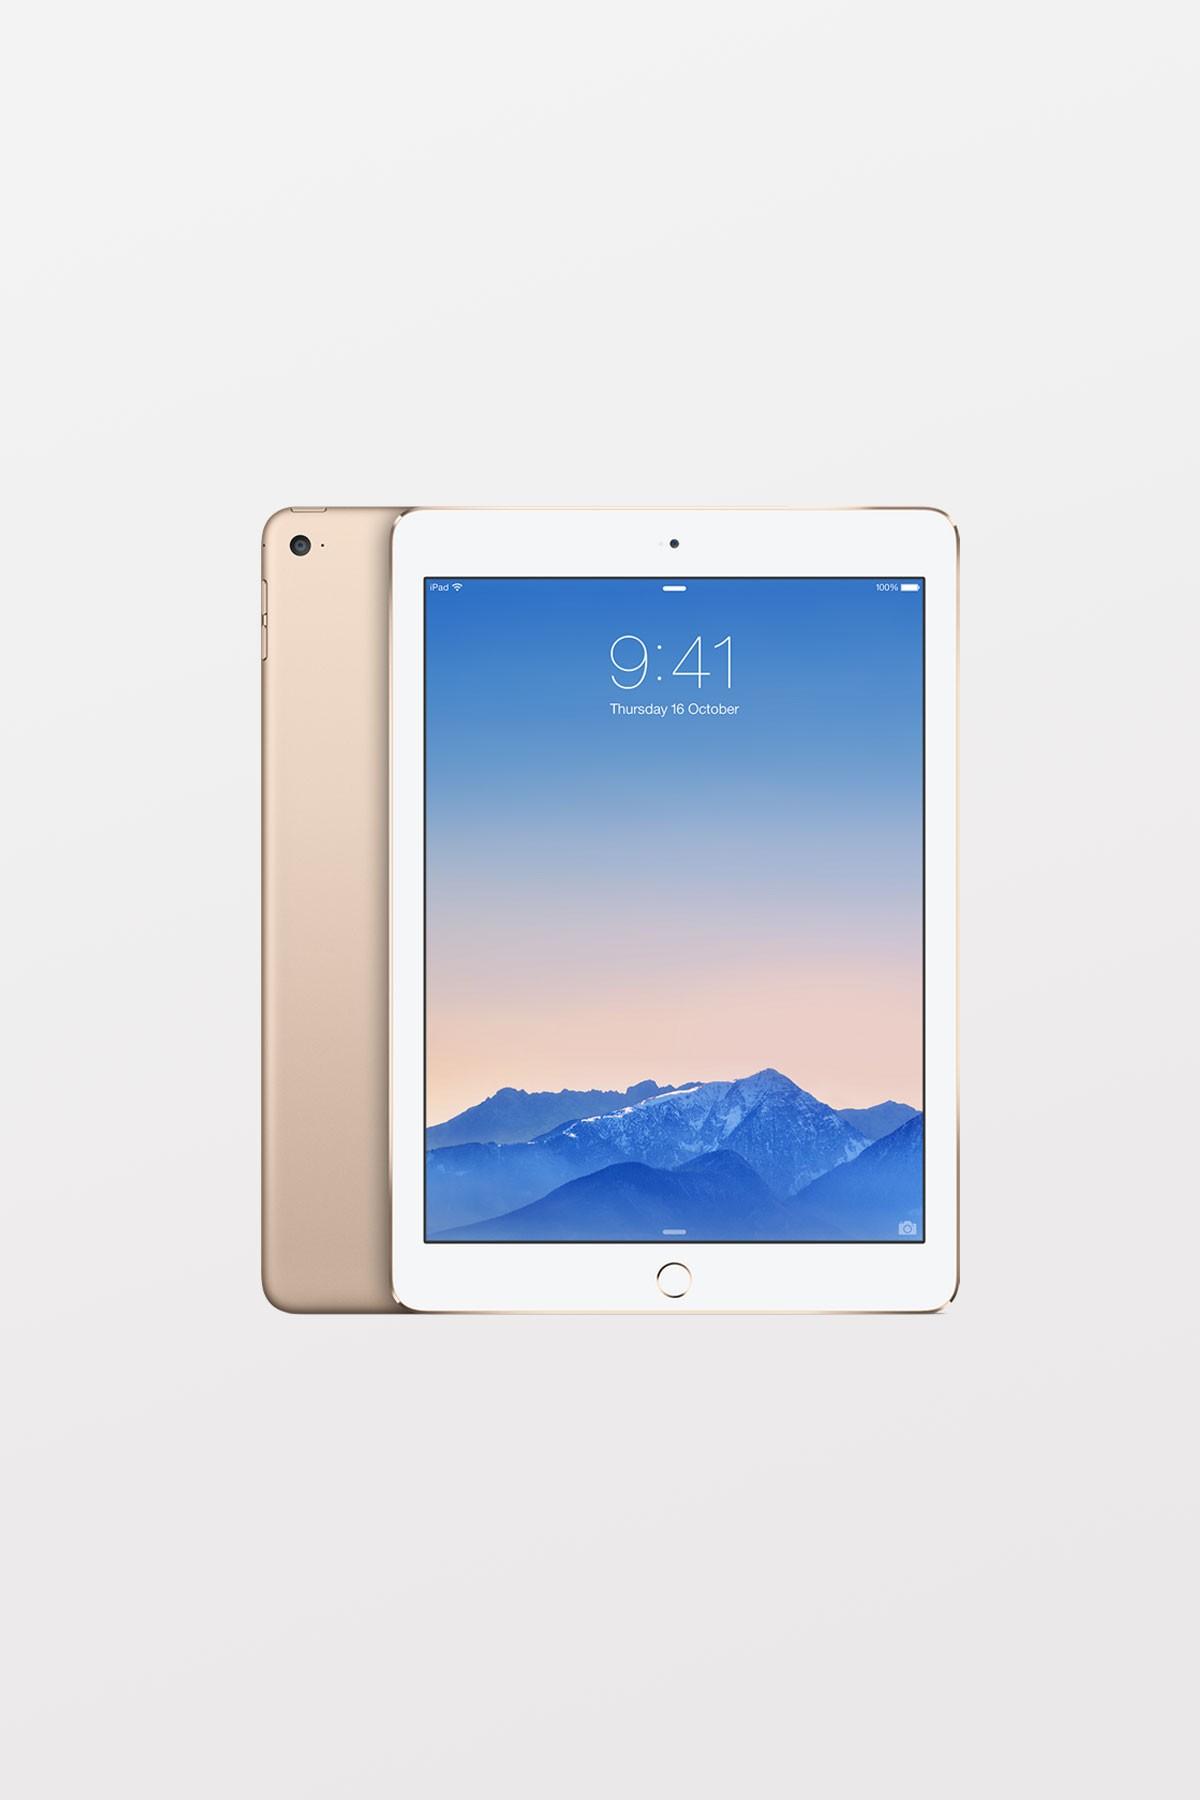 EOL Apple iPad Air 2 16GB Wi-Fi + Cellular - Gold